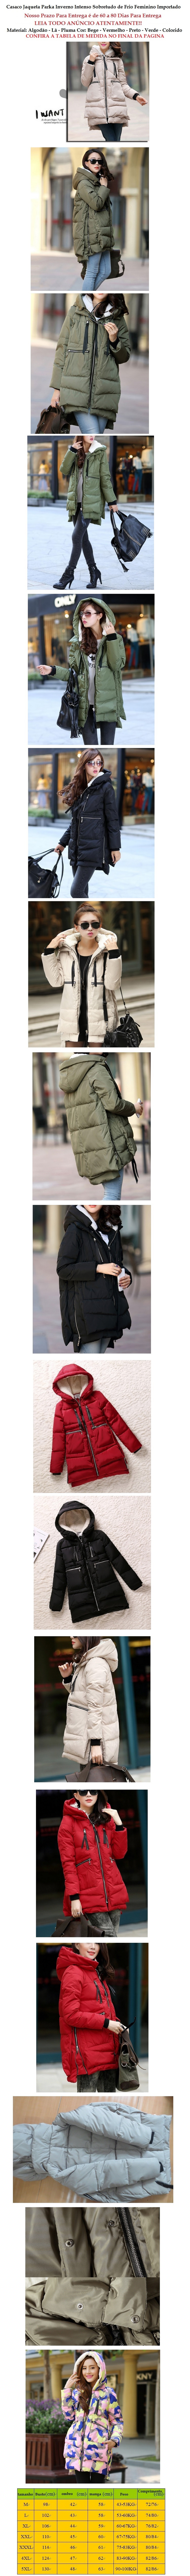 casacojaquetaparkainvernointensosobretudodefriofemininoimportado.jpg